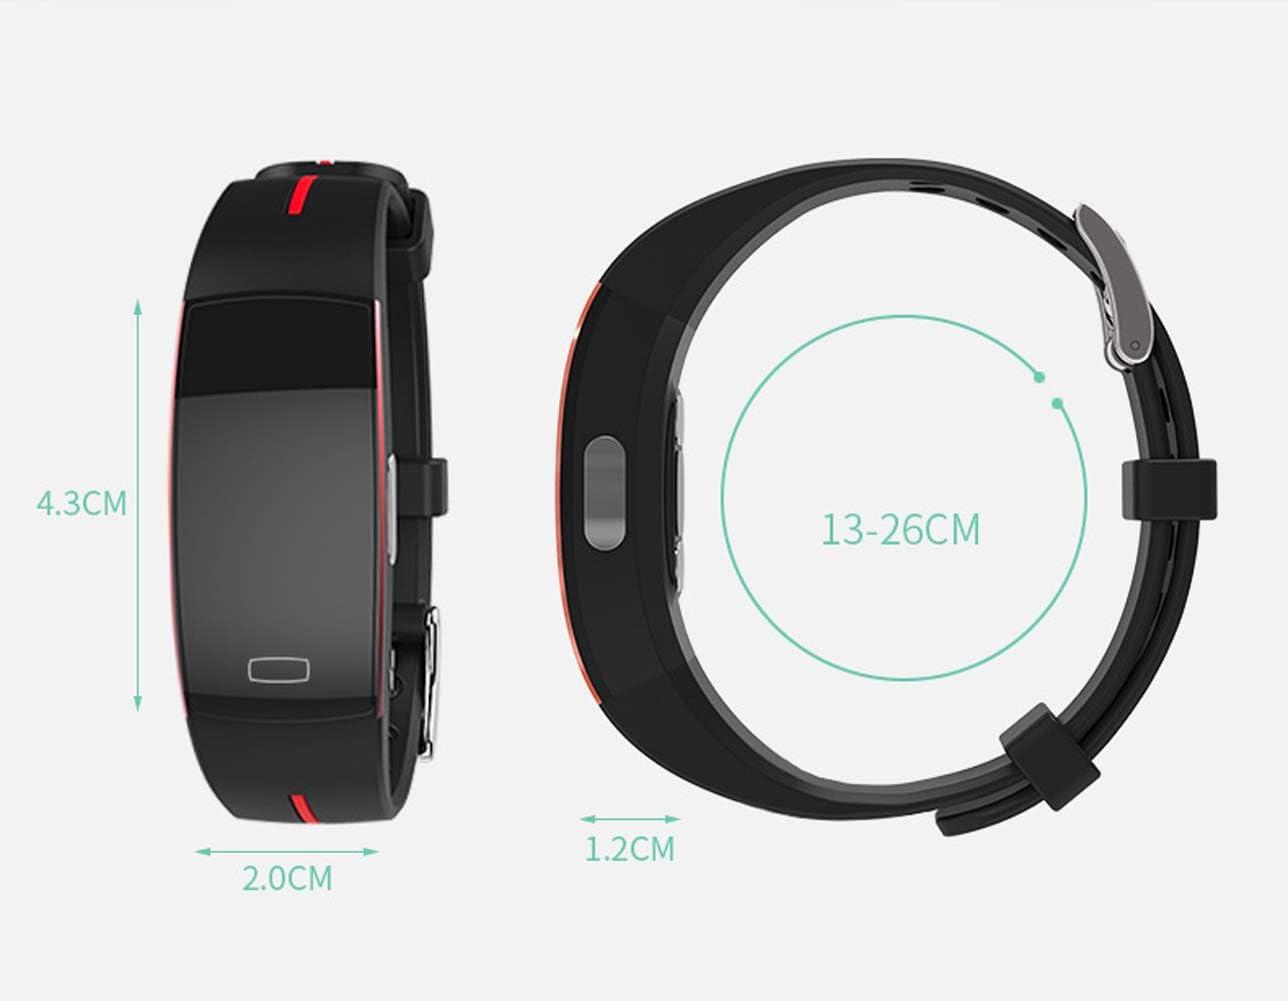 YHDQ P3 braccialetto intelligente PPG+ECG frequenza cardiaca ECG IP67 impermeabile Rosso